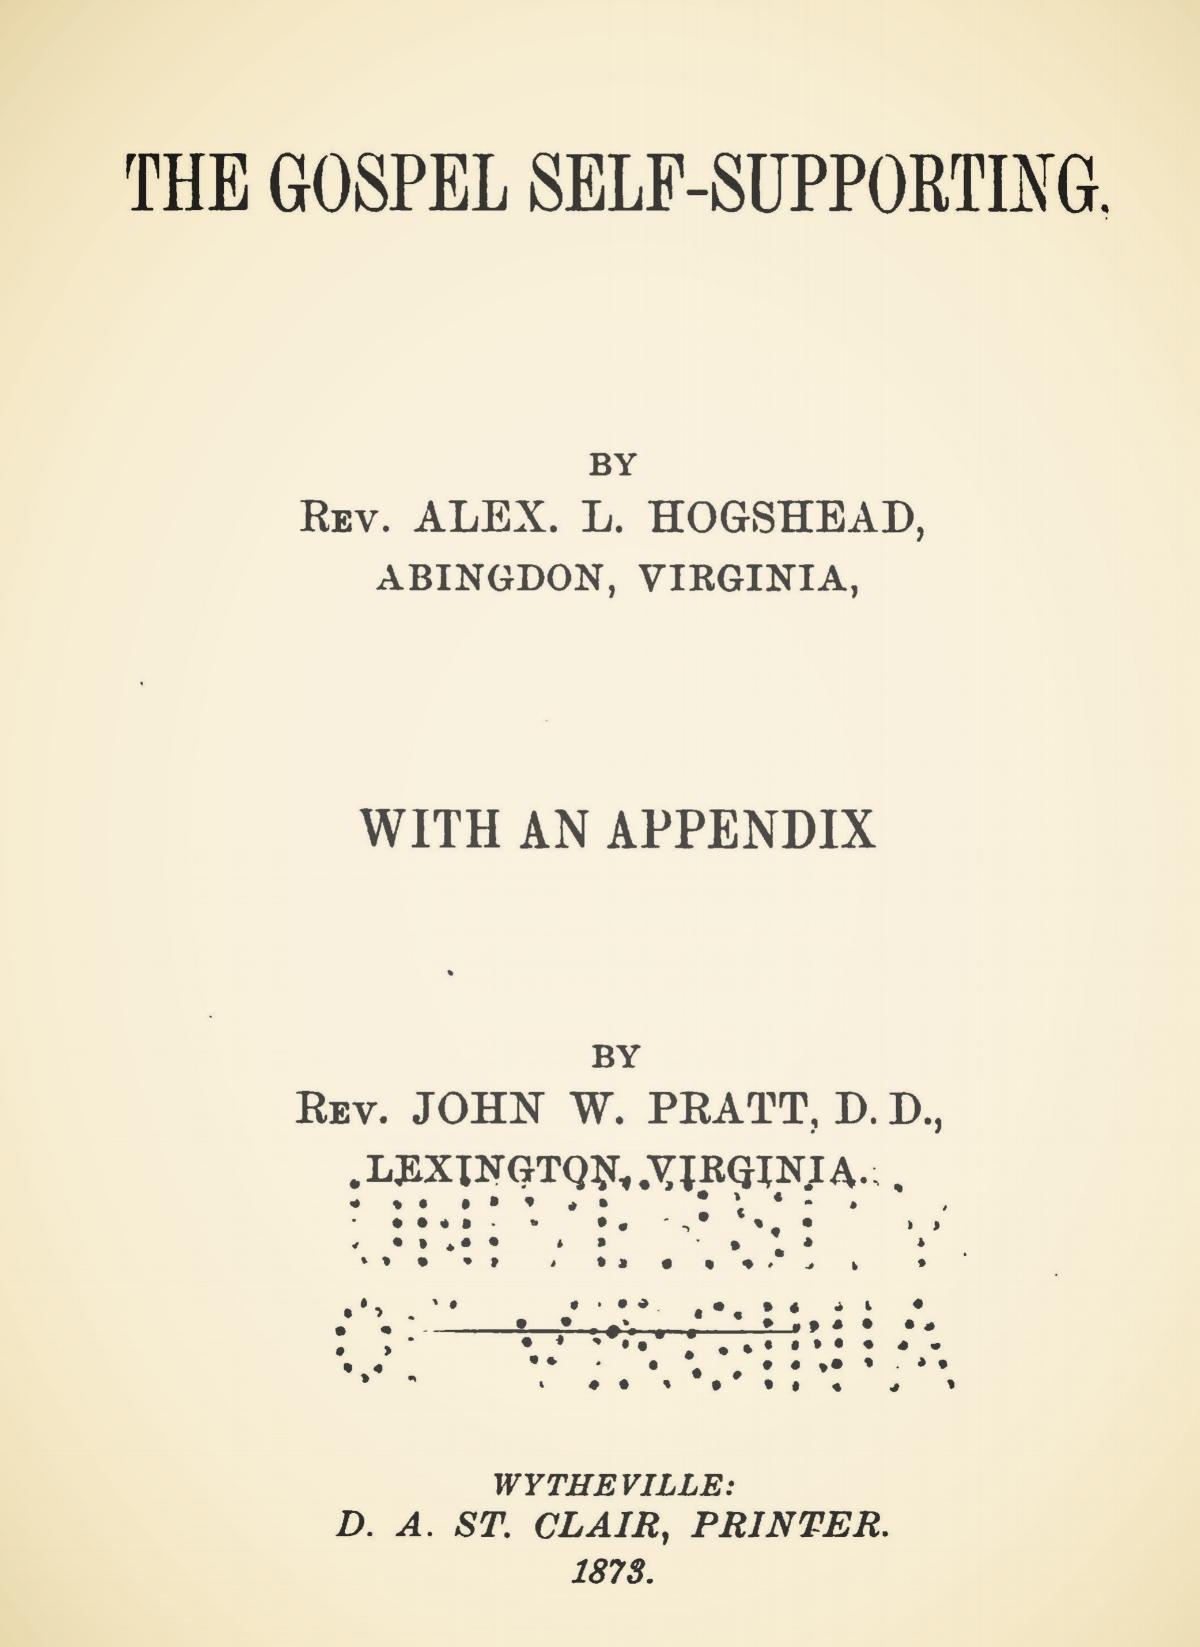 Hogshead, Alexander Lewis, The Gospel Self-Supporting Title Page.jpg